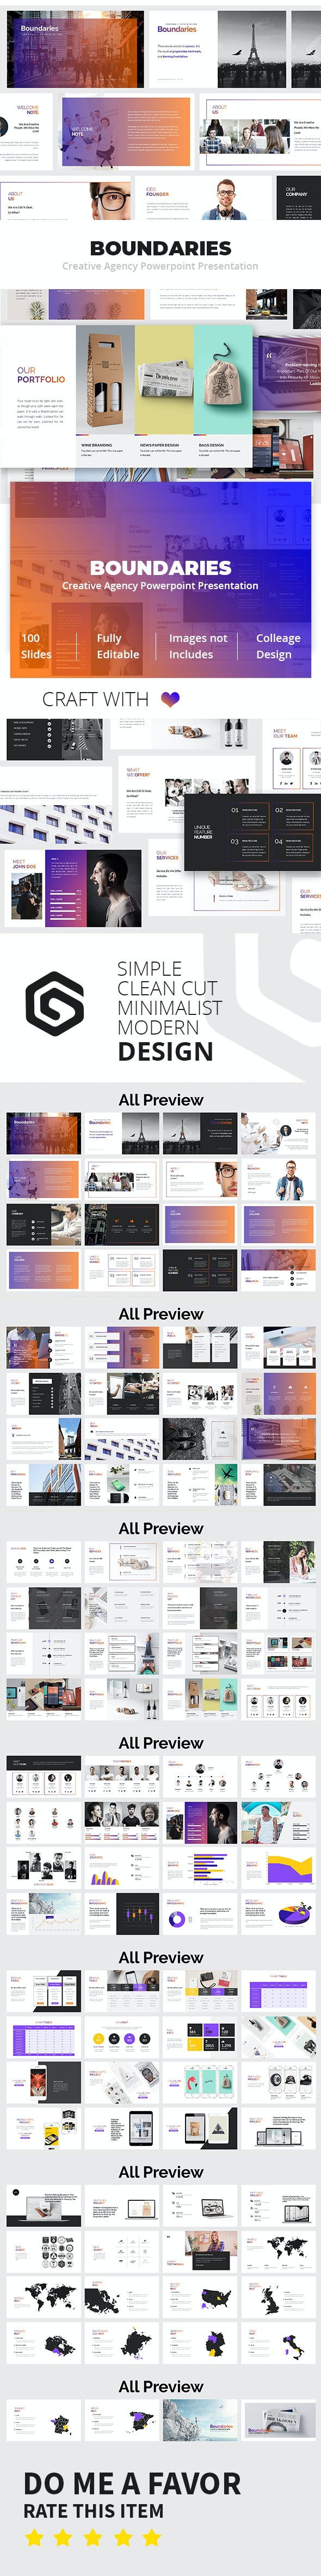 Boundaries Creative Agency Powerpoint Presentation - Creative PowerPoint Templates